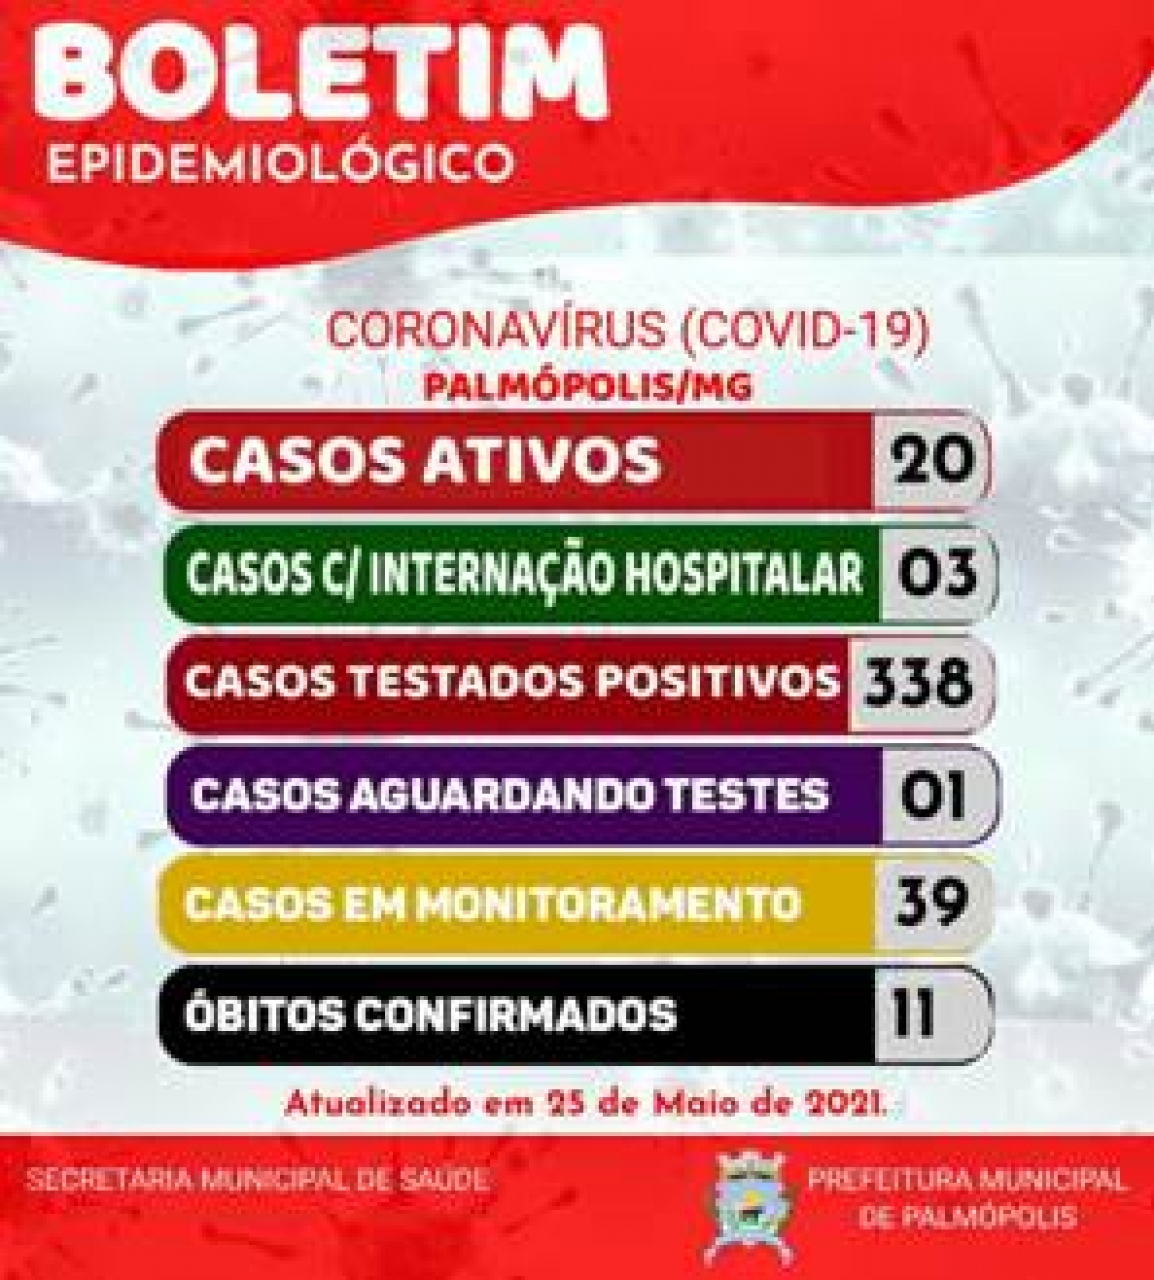 BOLETIM CORONAVIRUS 25-05-2021